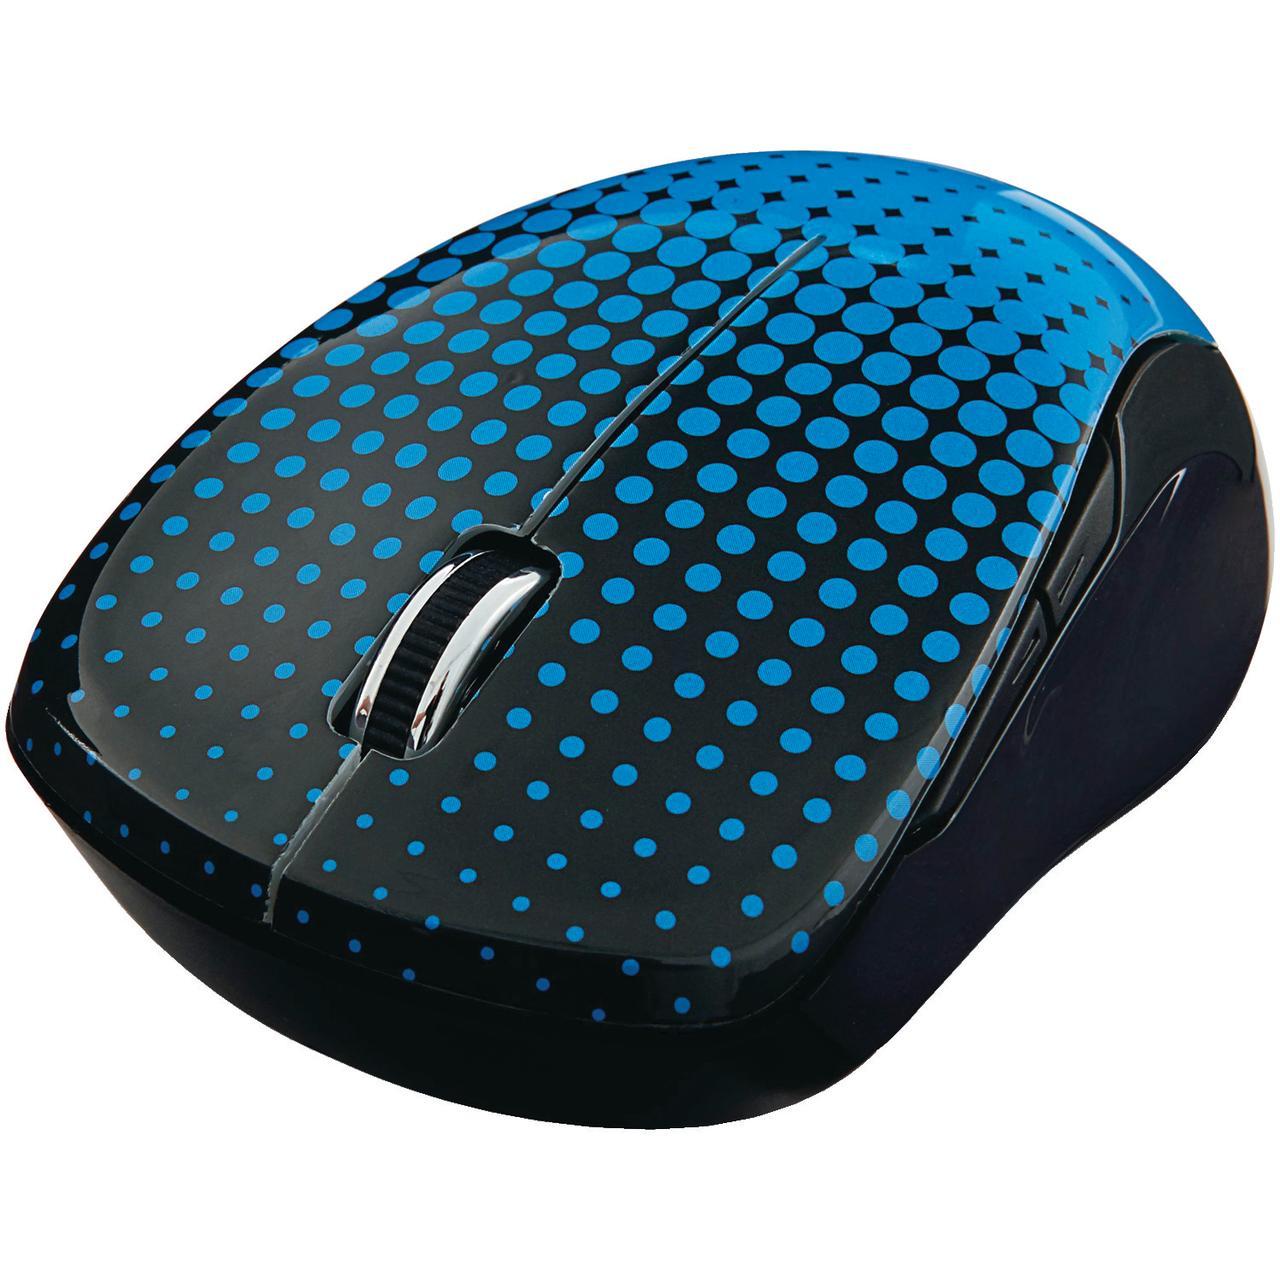 Verbatim 99747 Wireless Notebook Multi-Trac Blue LED Mouse (Dot Pattern; Blue)